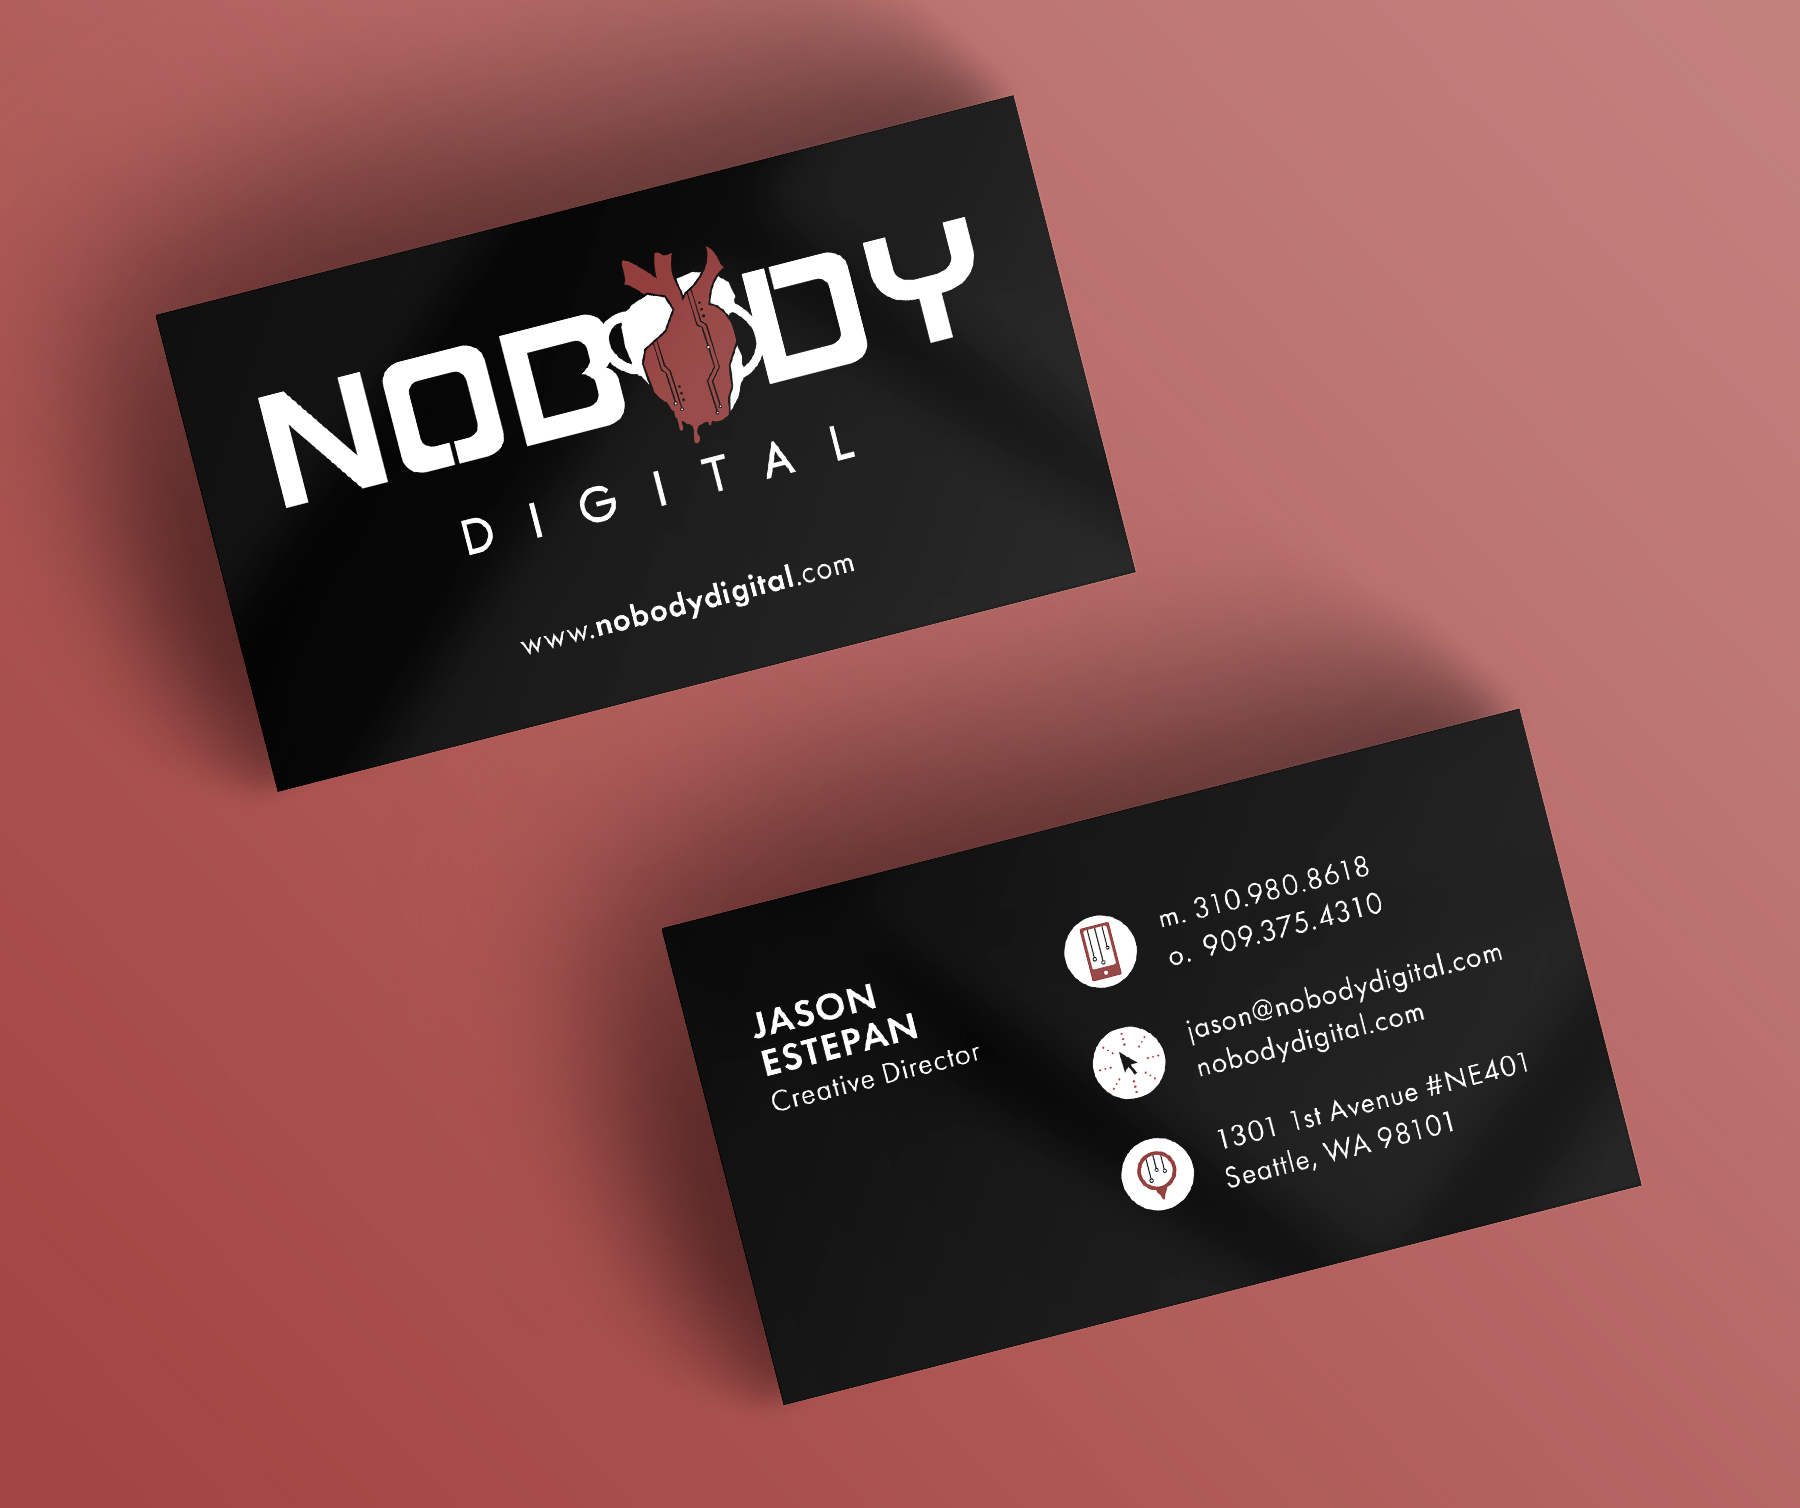 nobody_digital_business_card.jpg